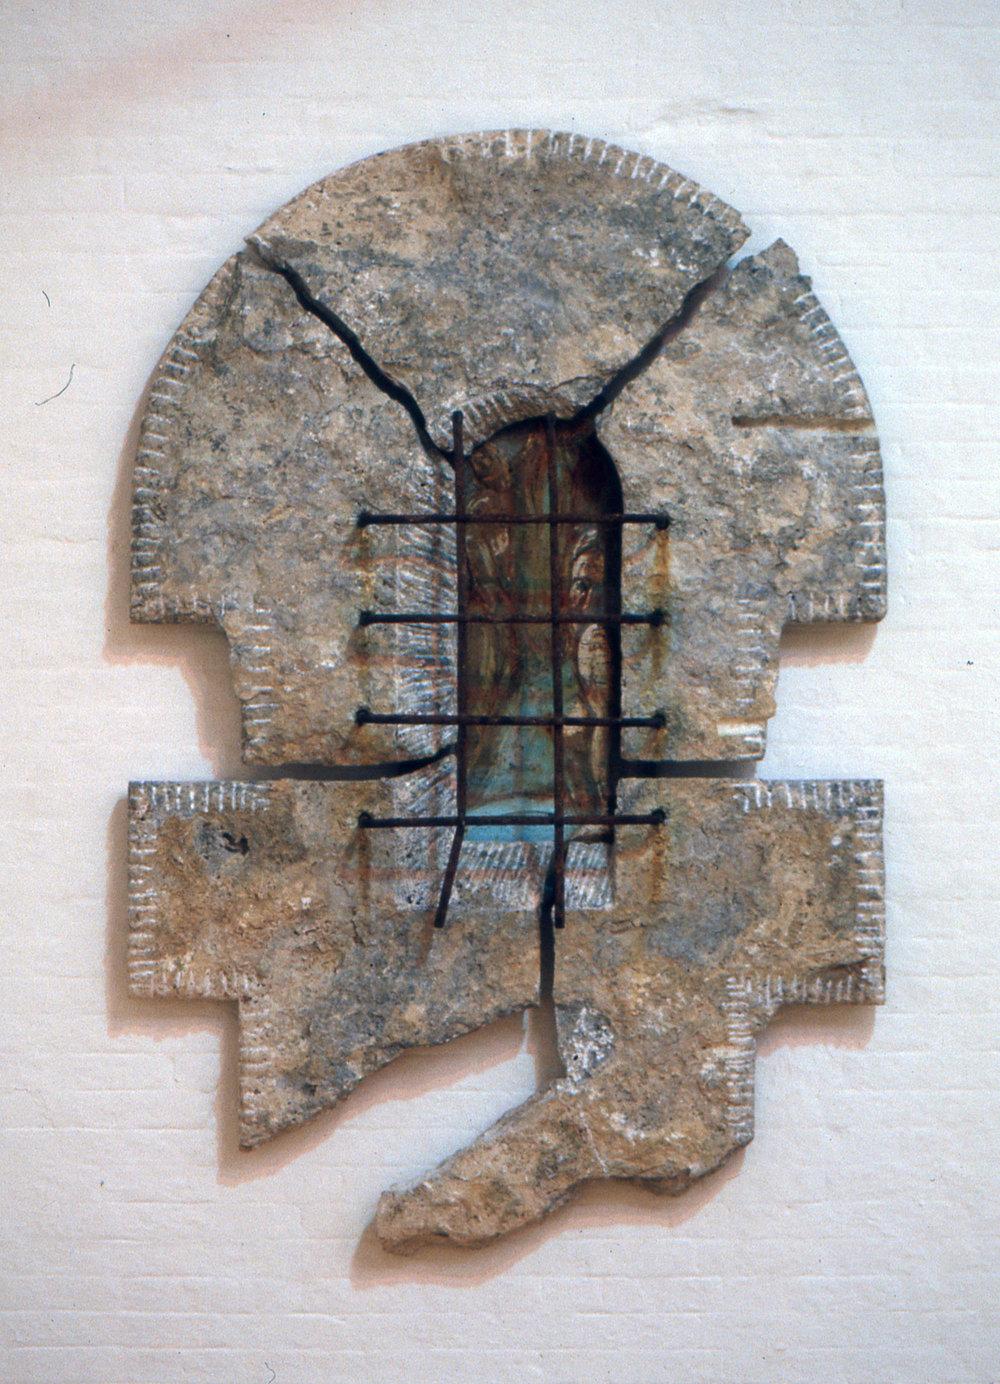 Stephen-Cox-Figures-Through-a-Window-II-1984.jpg